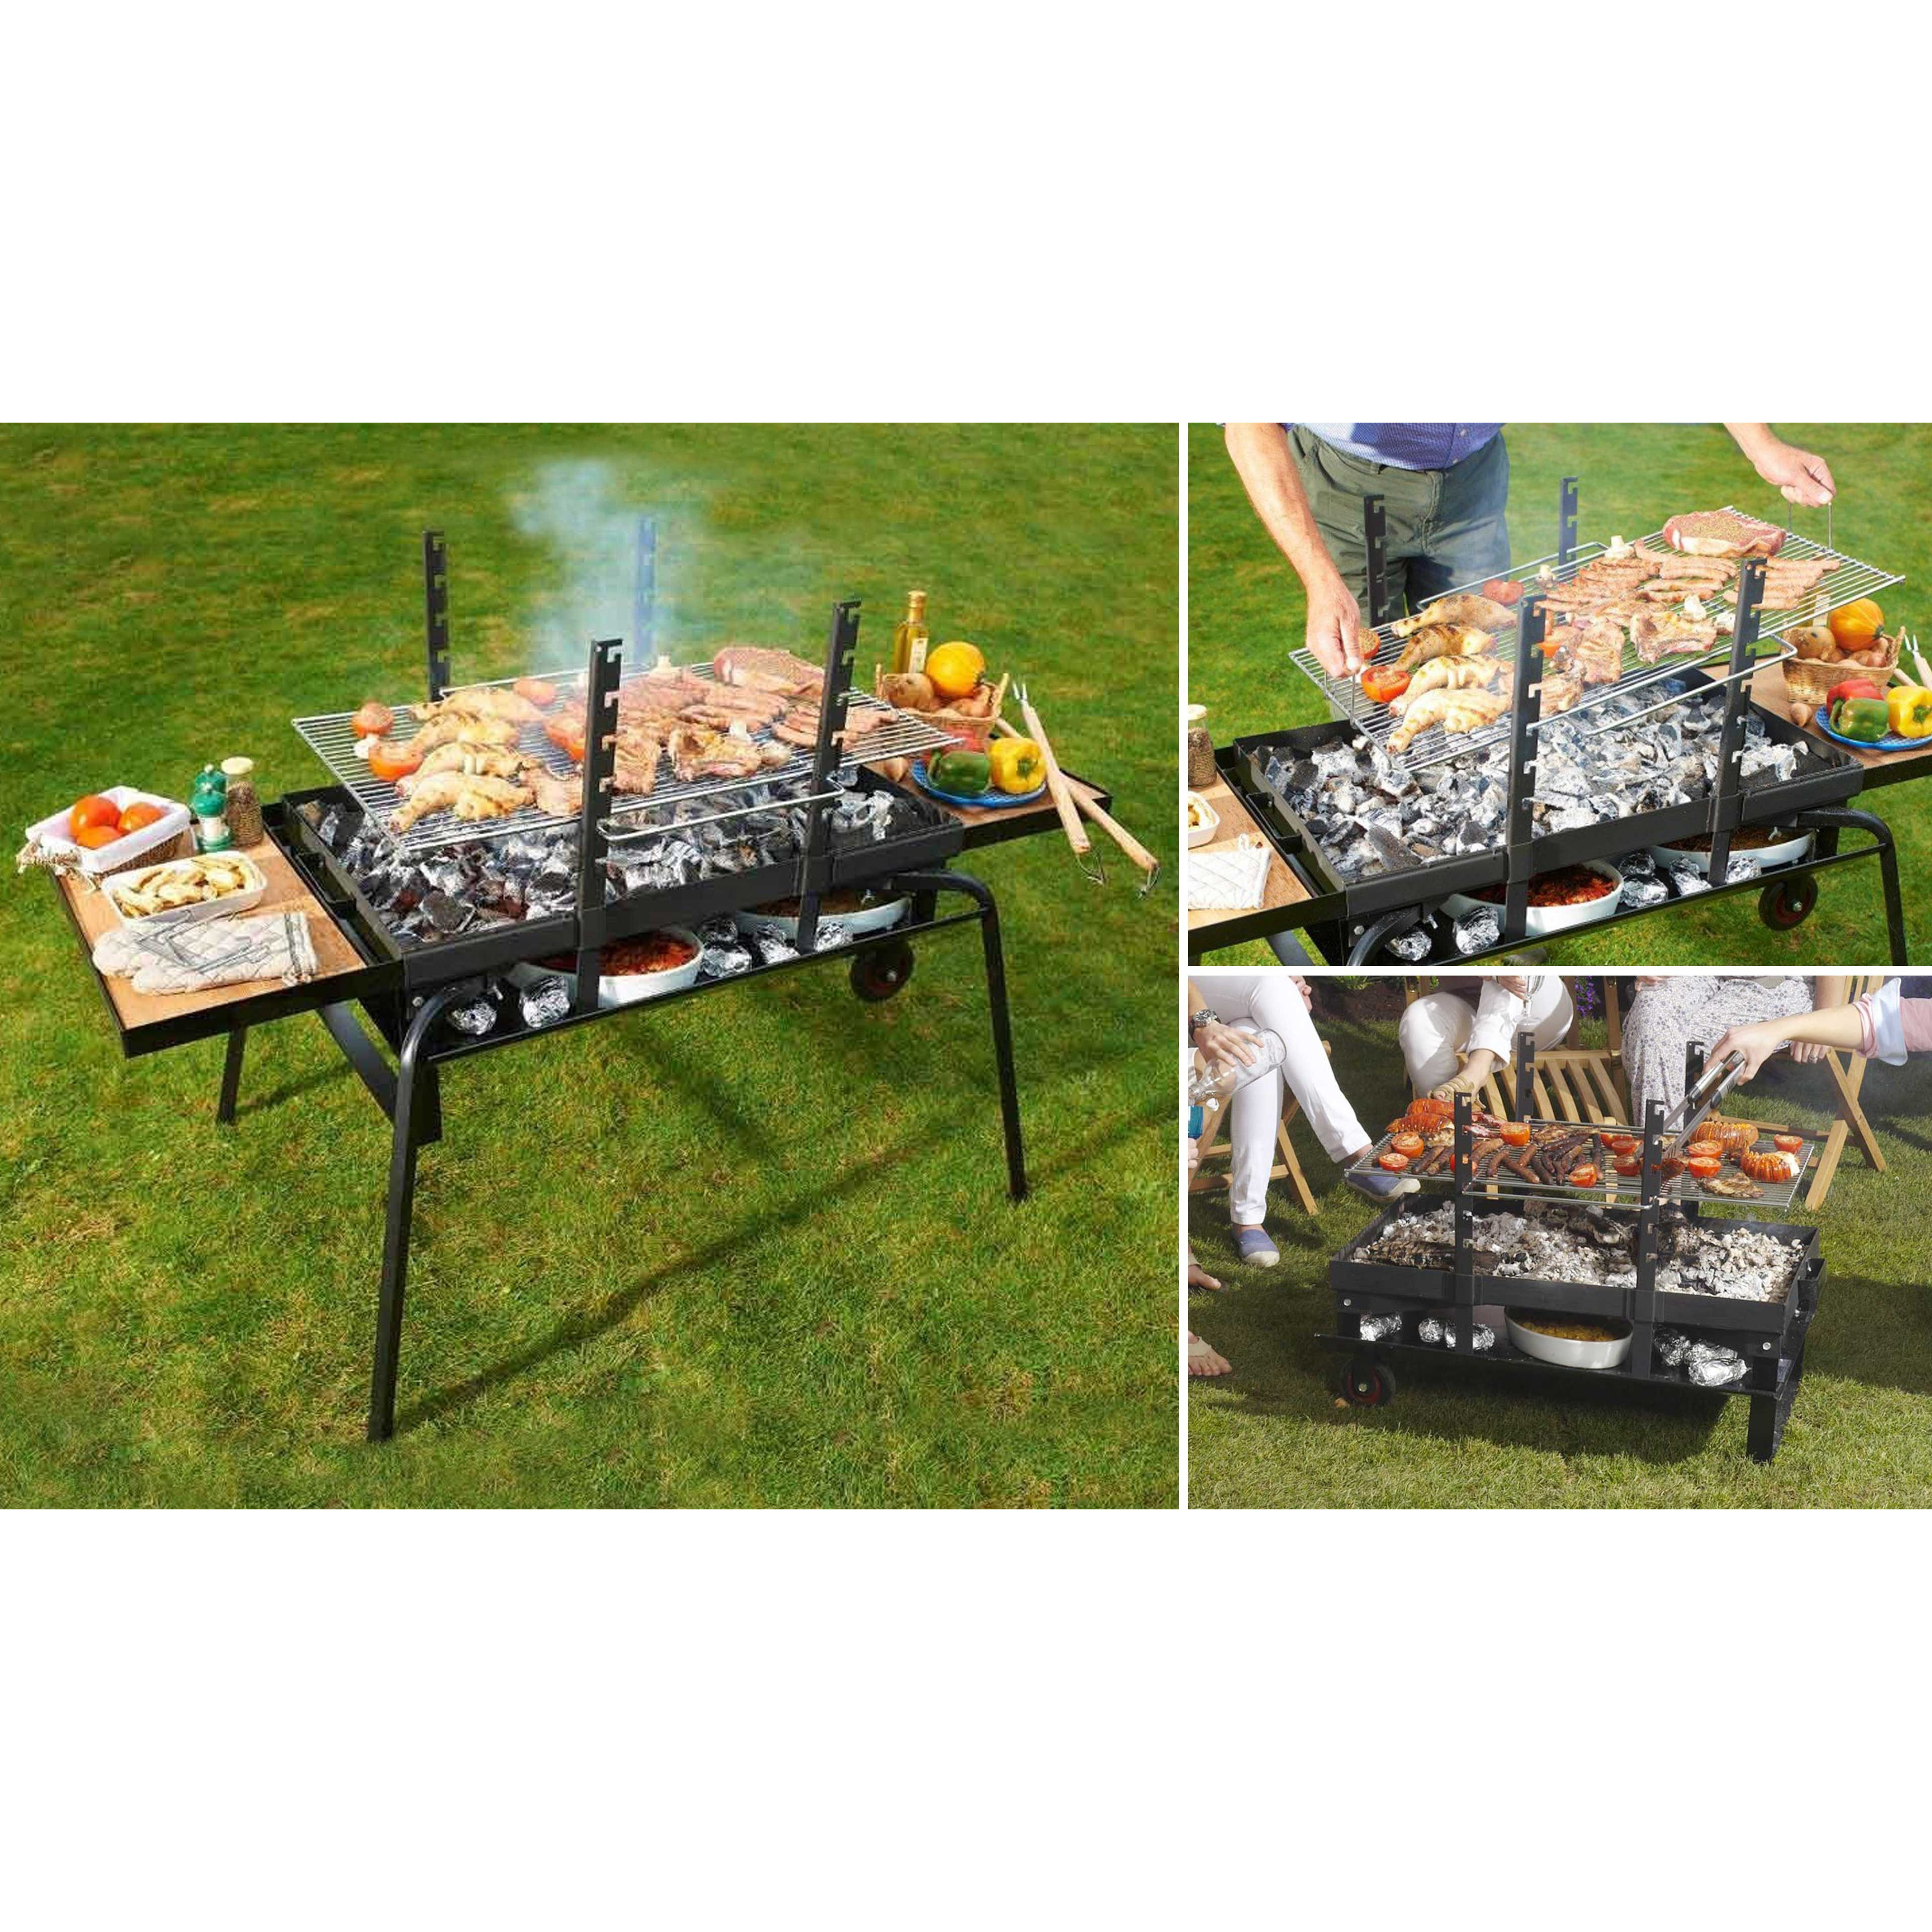 brasero barbecue géant   oviala